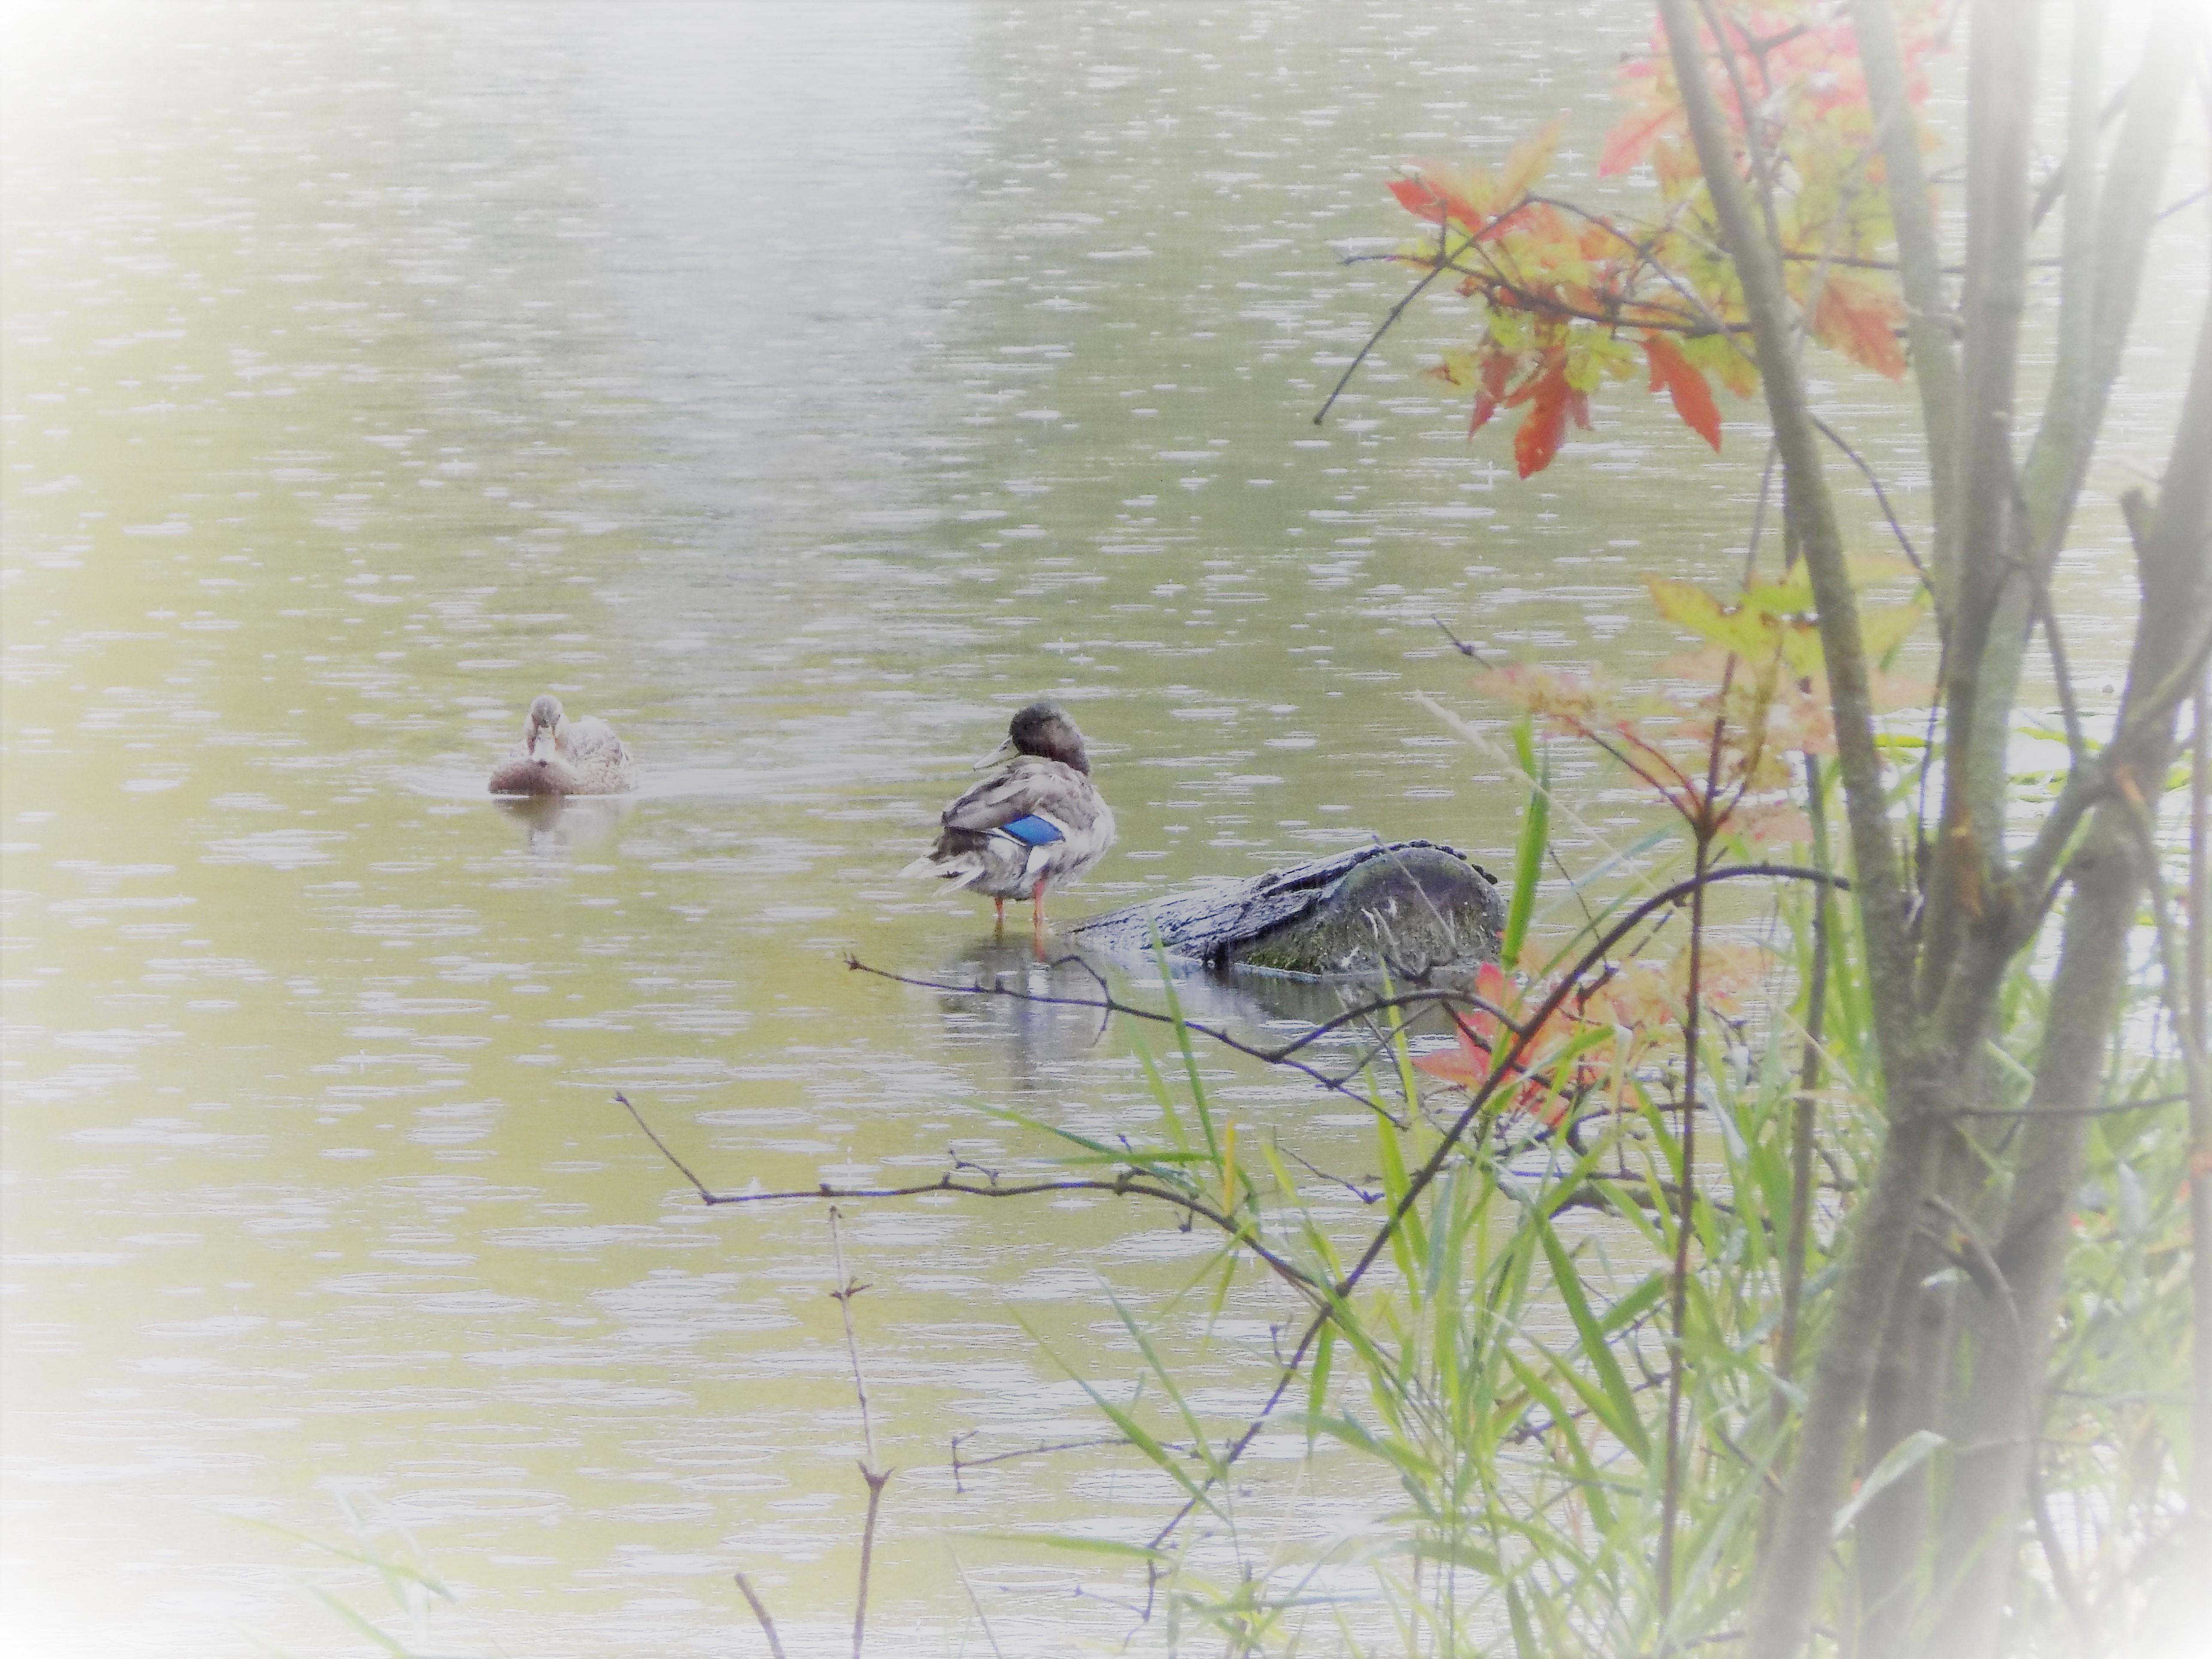 ducks in fall 2018